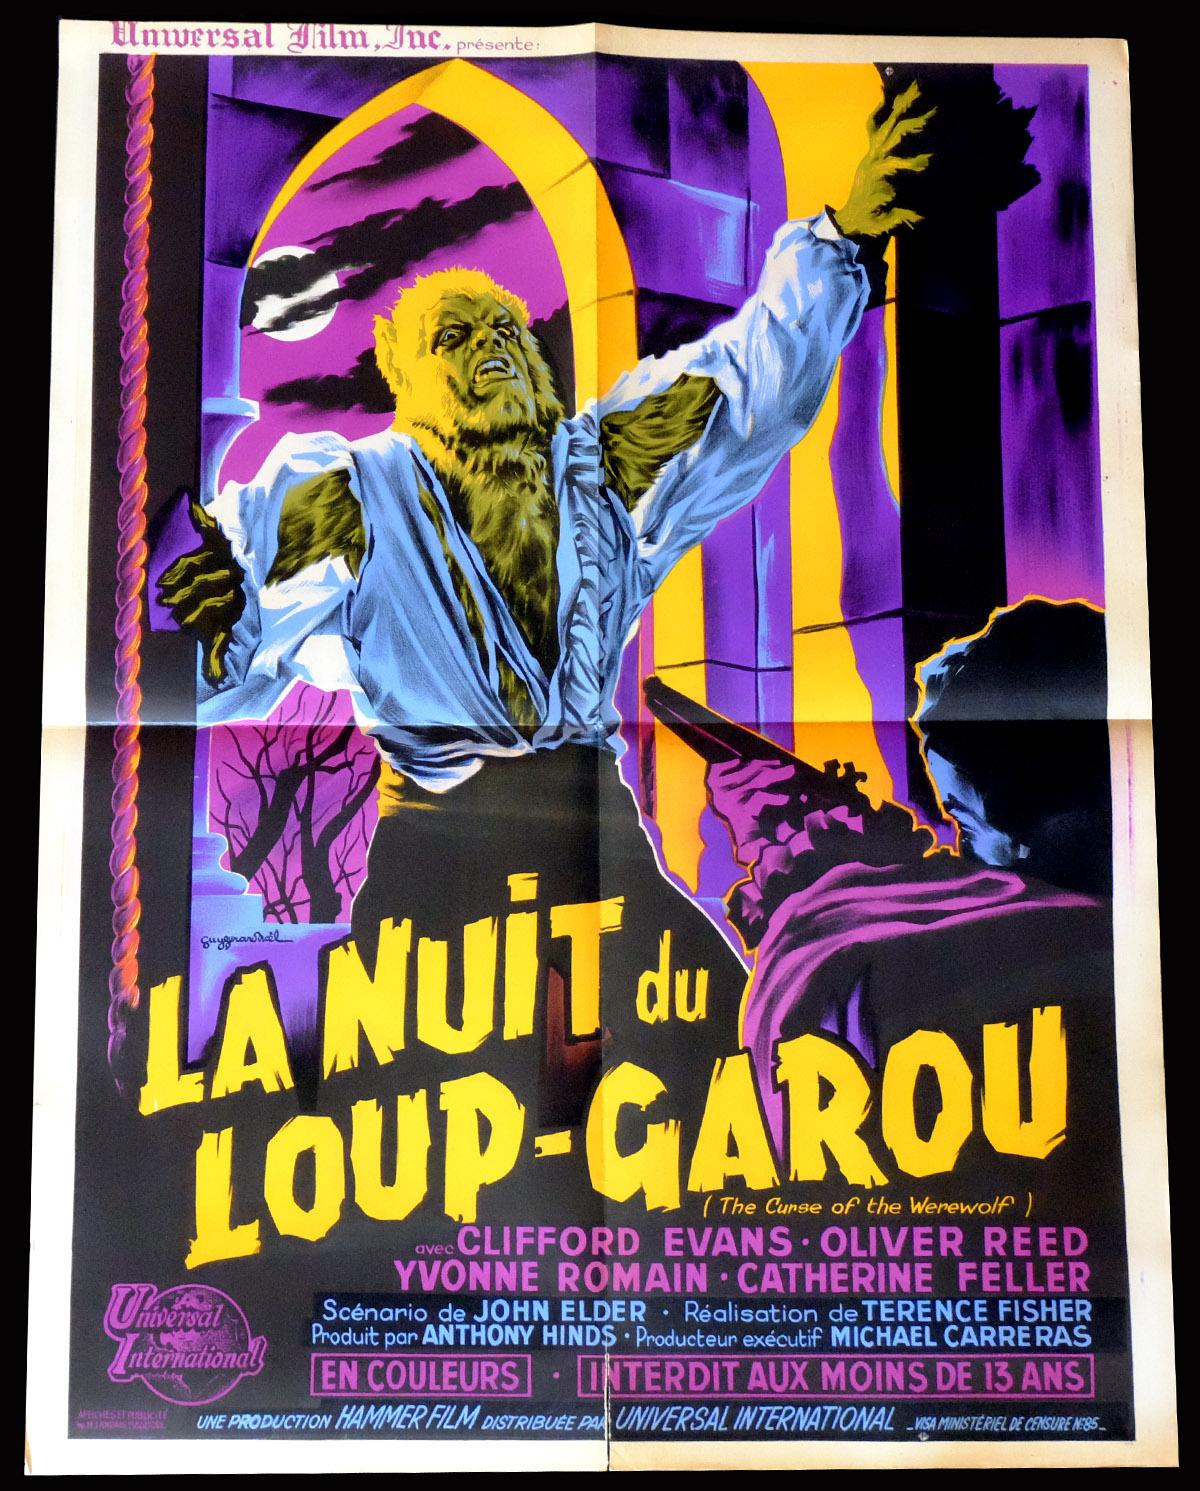 la-nuit-du-loup-garou-affiche-de-film-60x80-1961-terence-fisher-hammer.jpg